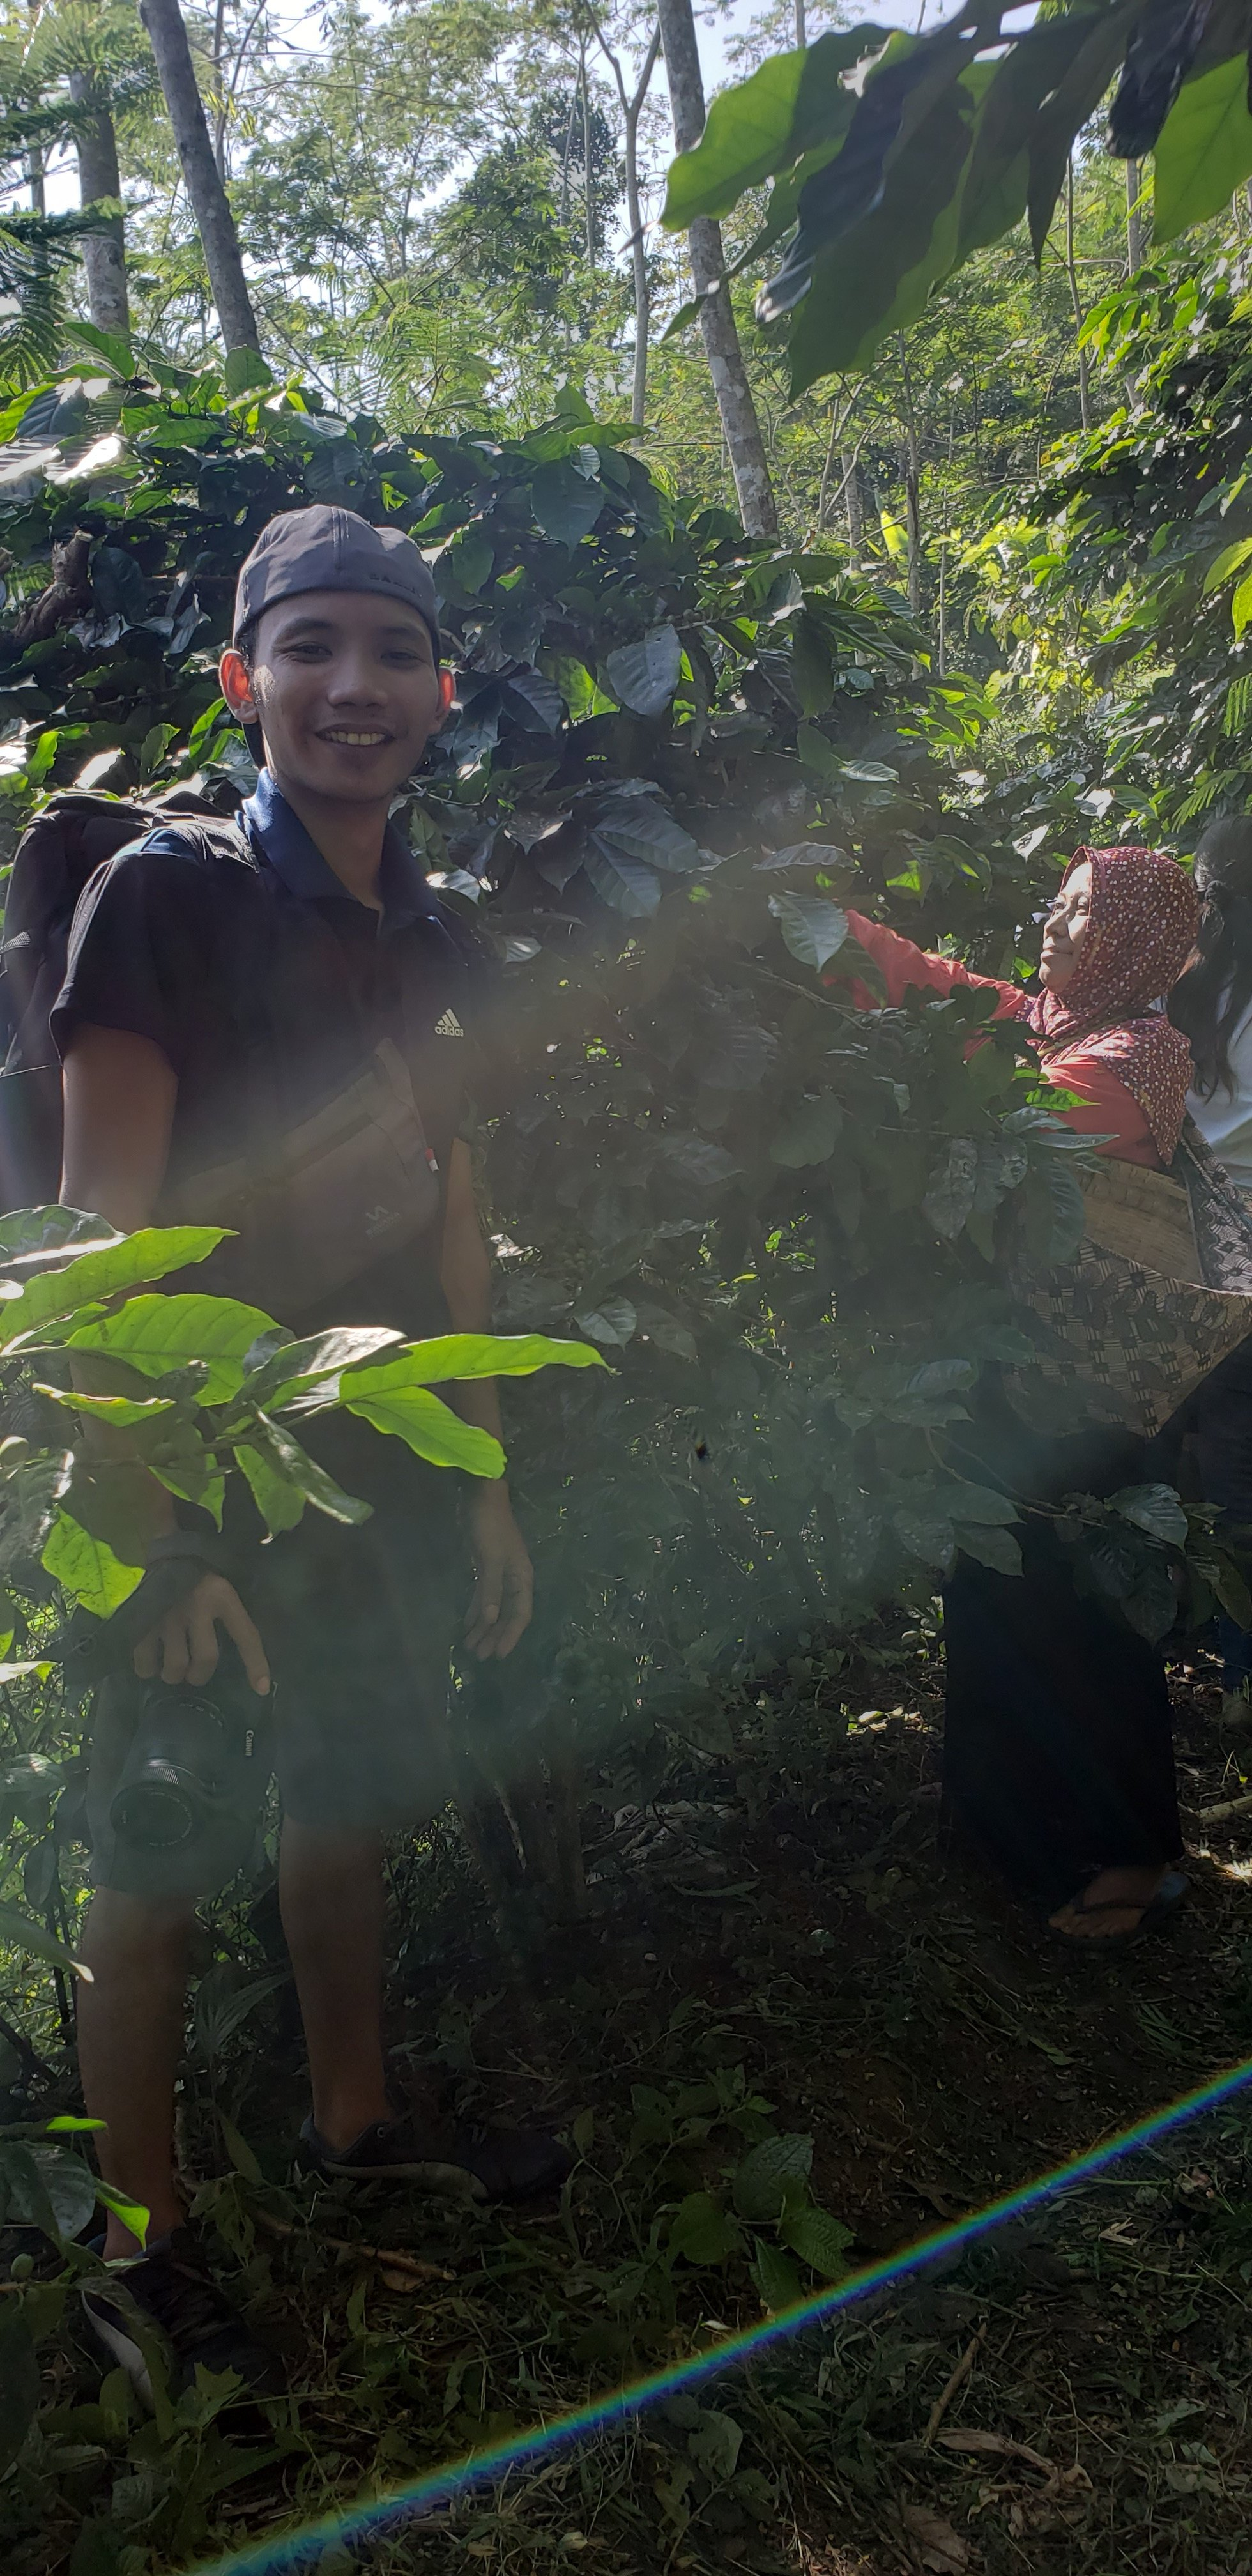 Farsijana's student Roli harvesting coffee beans with Mrs. Marwiyah.